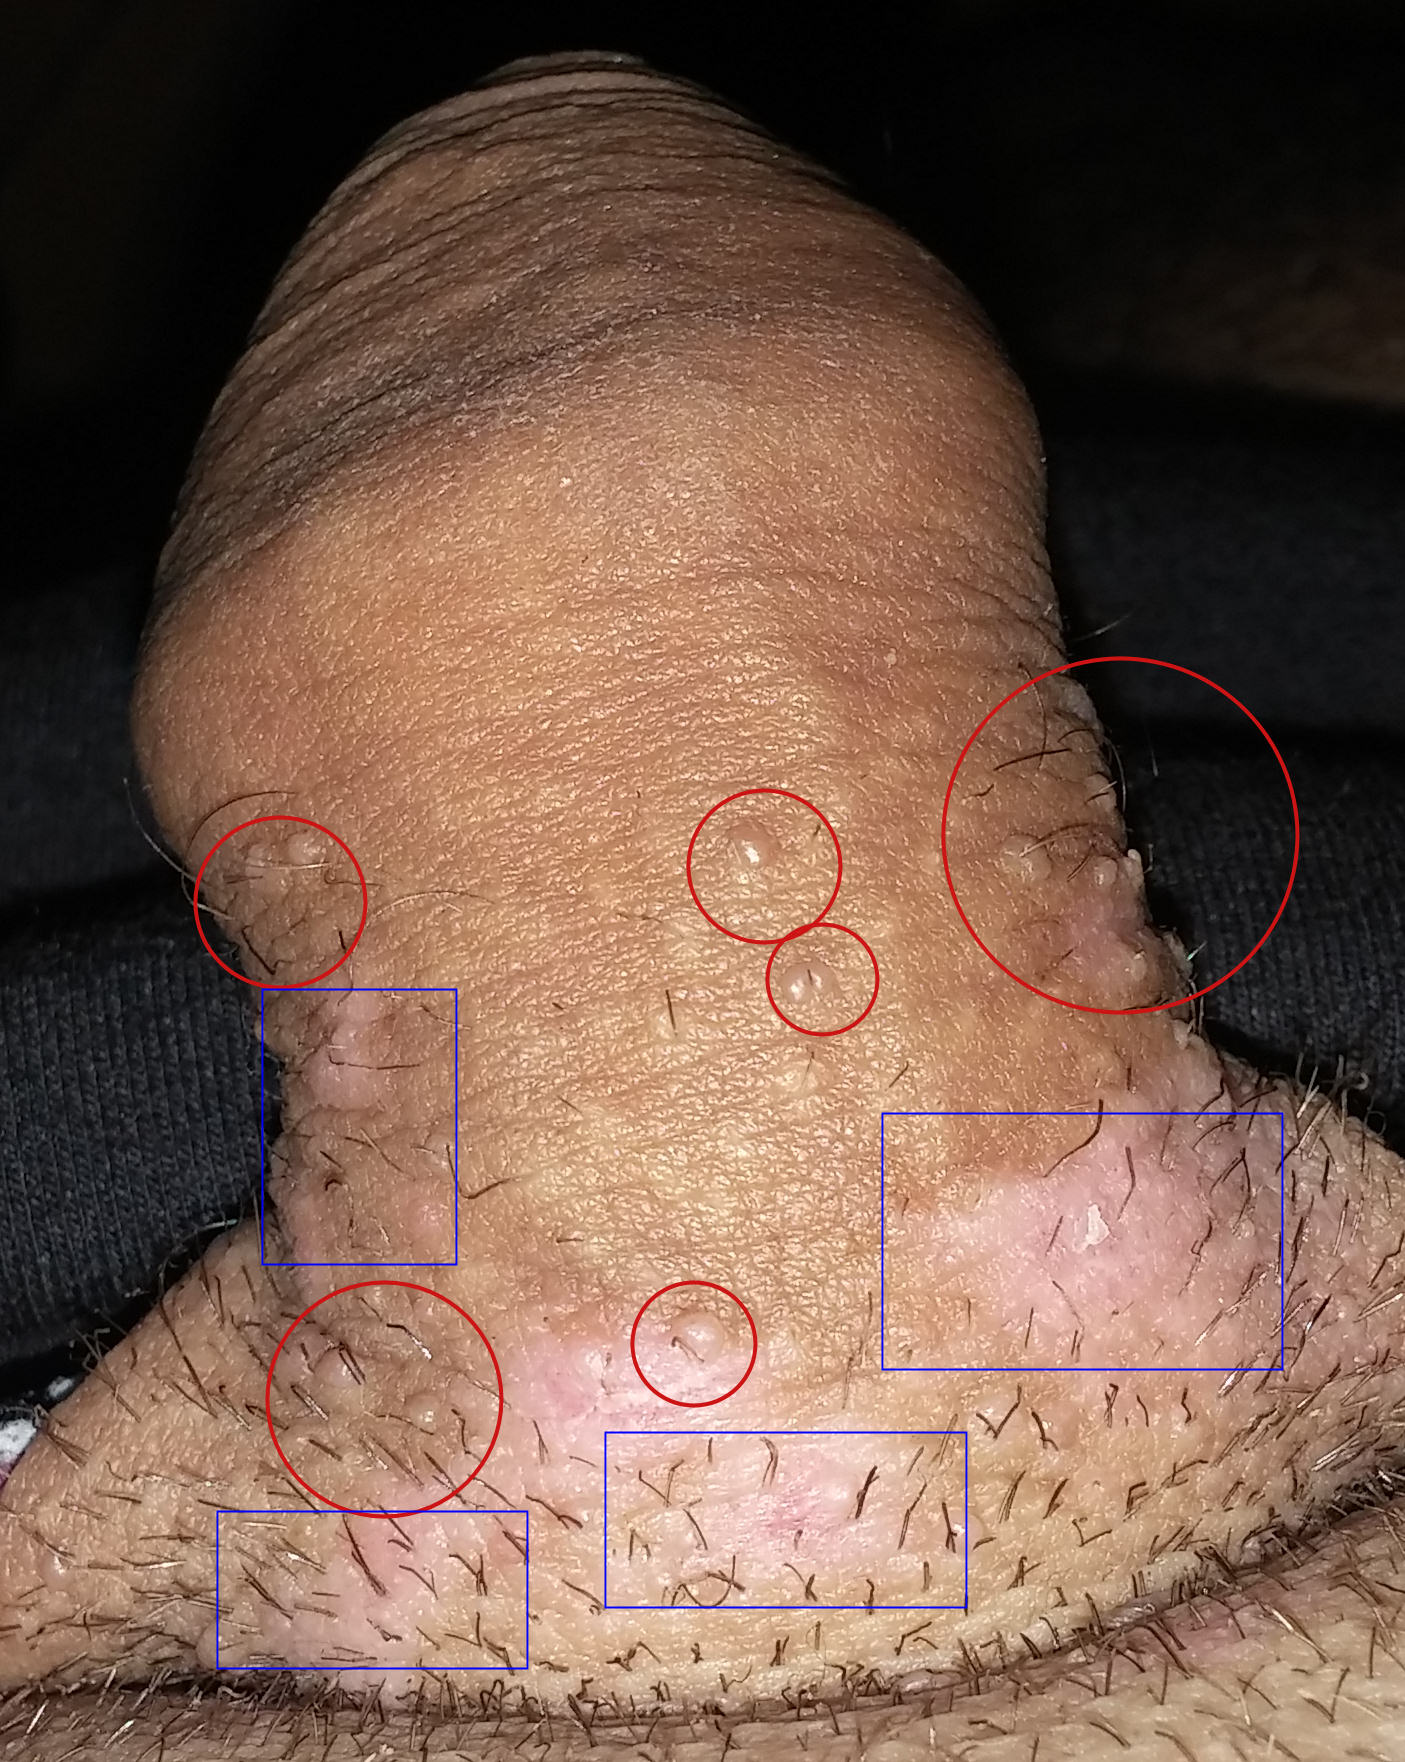 Prostatite du scrotum qui démange